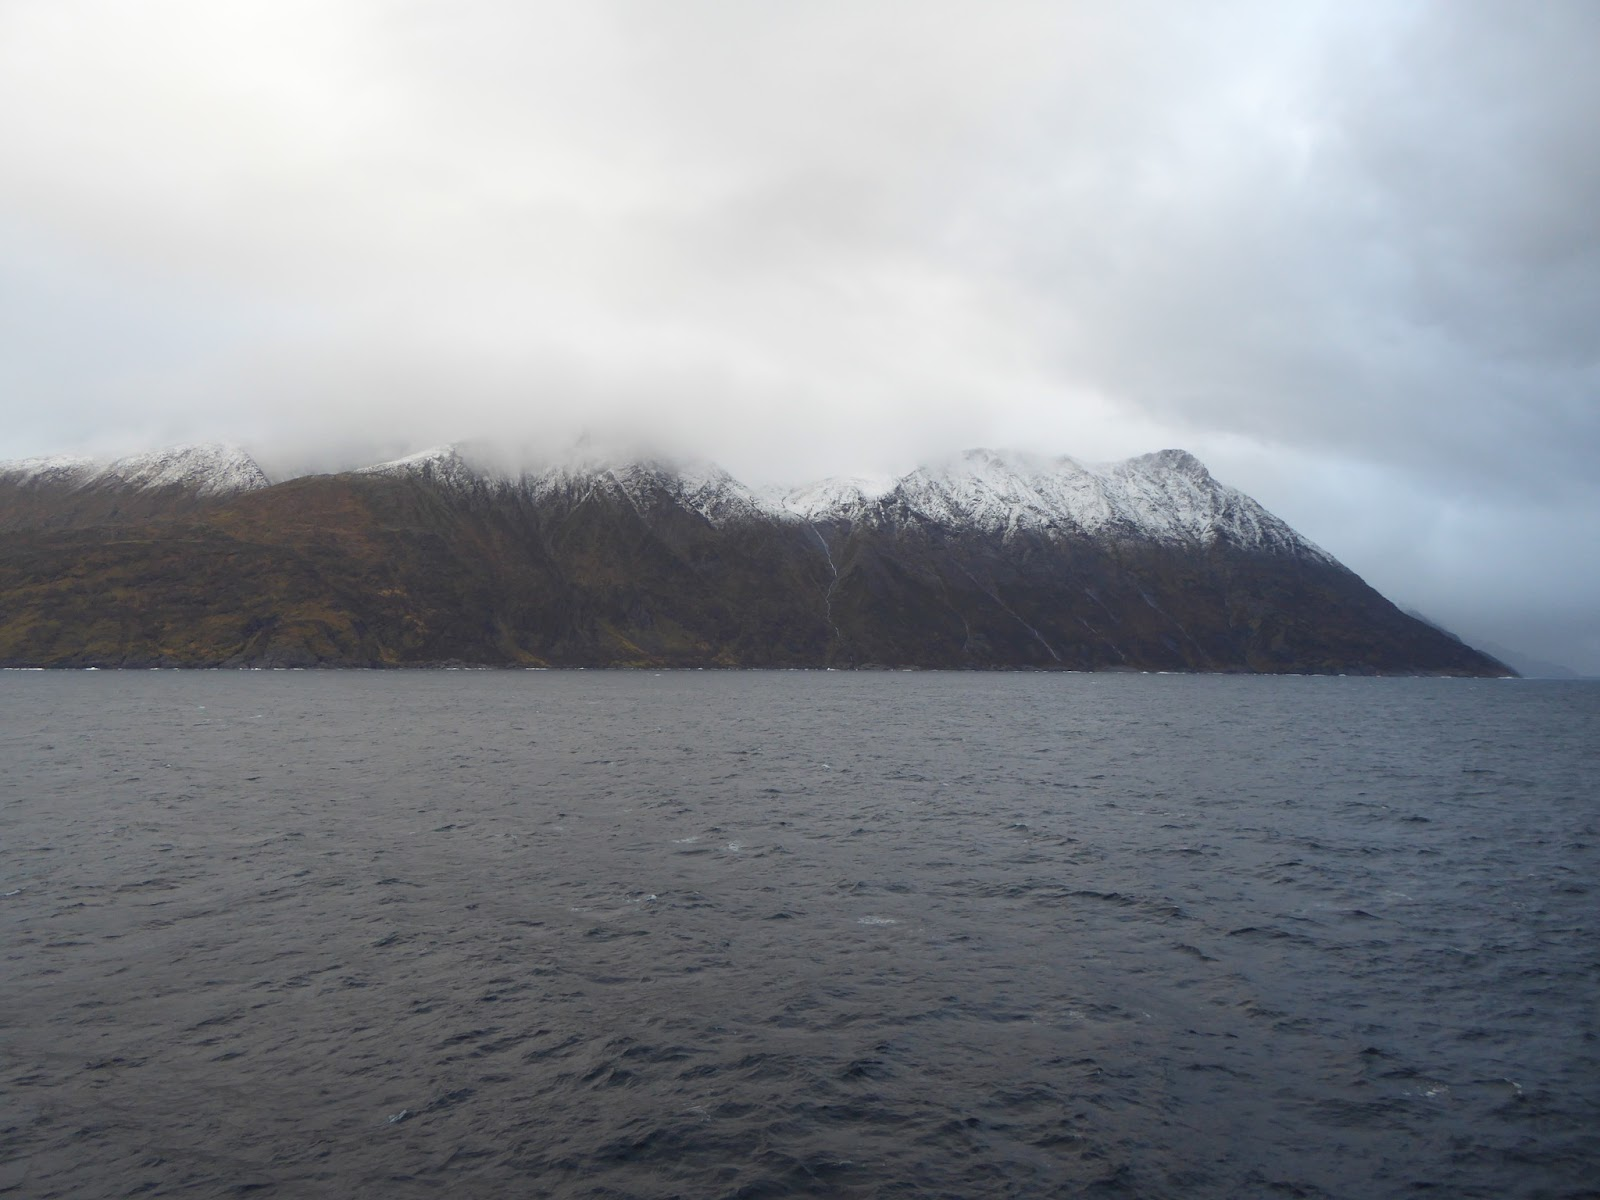 Approaching Oksfjord